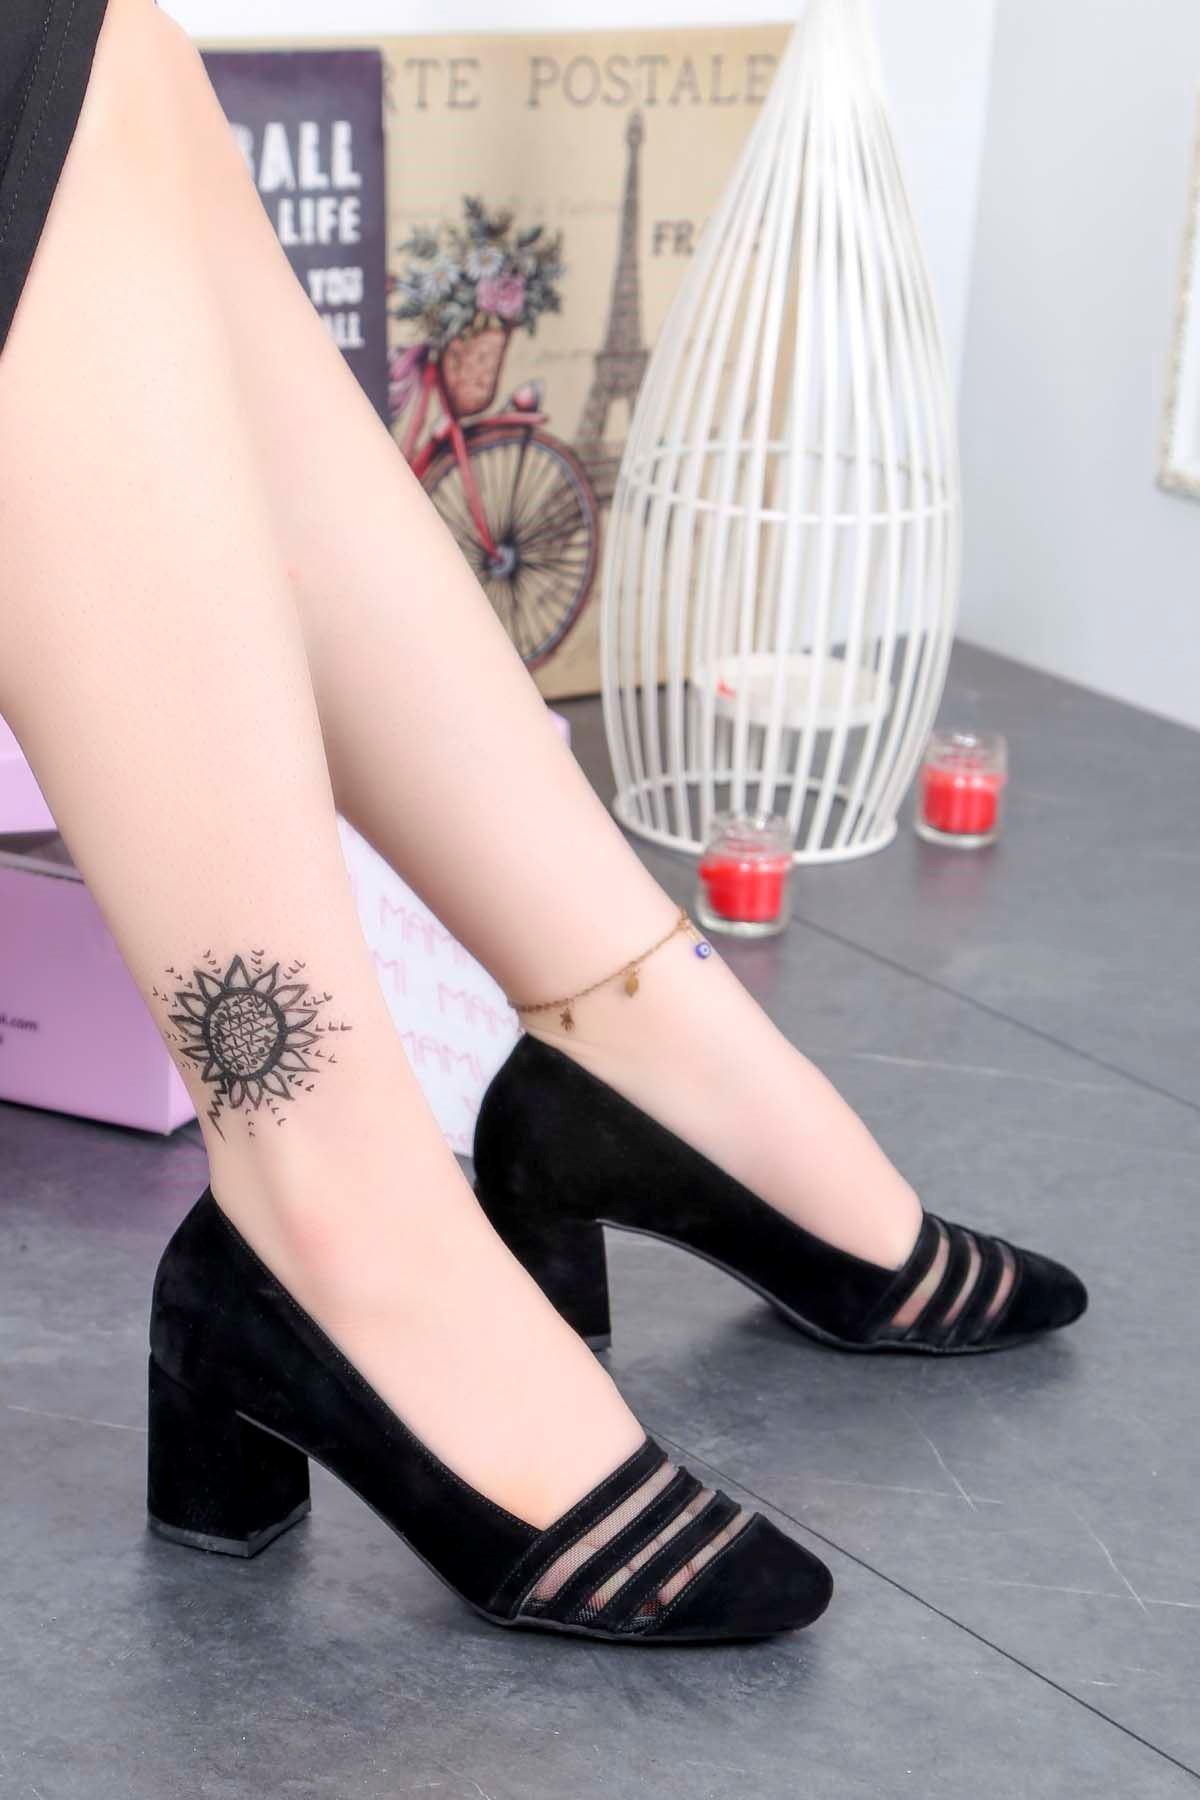 Fls-500 Tül Detay Ayakkabı Siyah Süet